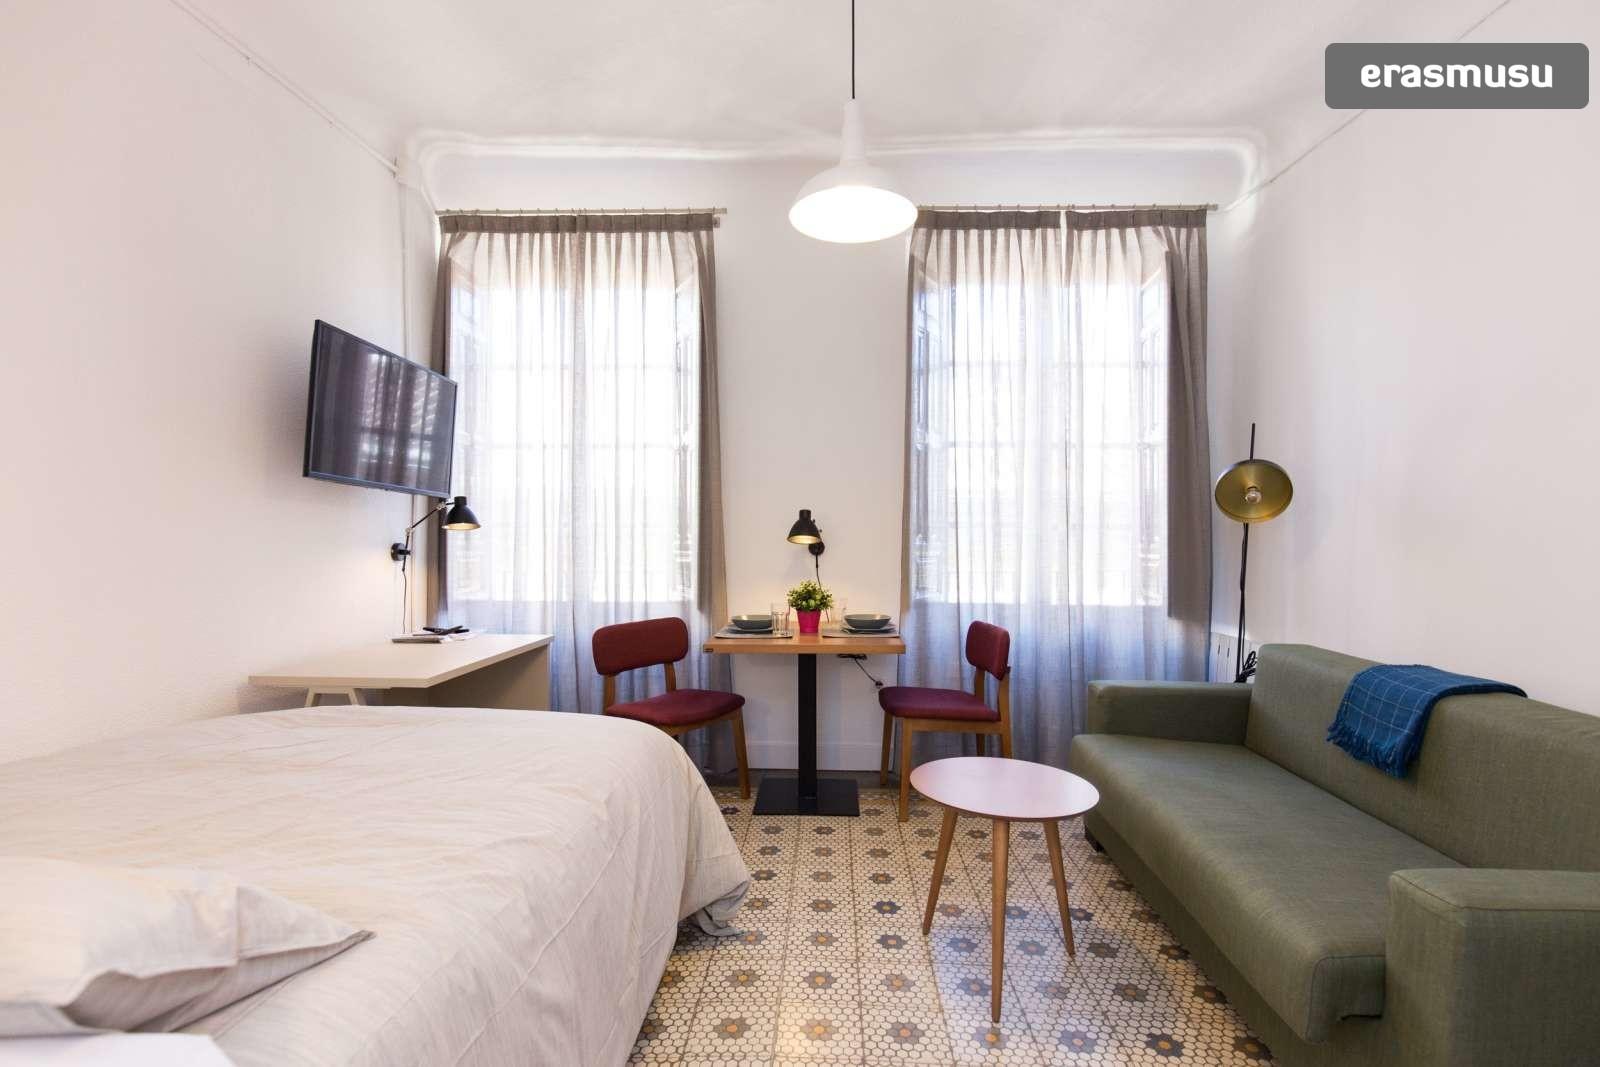 charming-studio-apartment-rent-city-centre-3841c4aa0e6054b754384